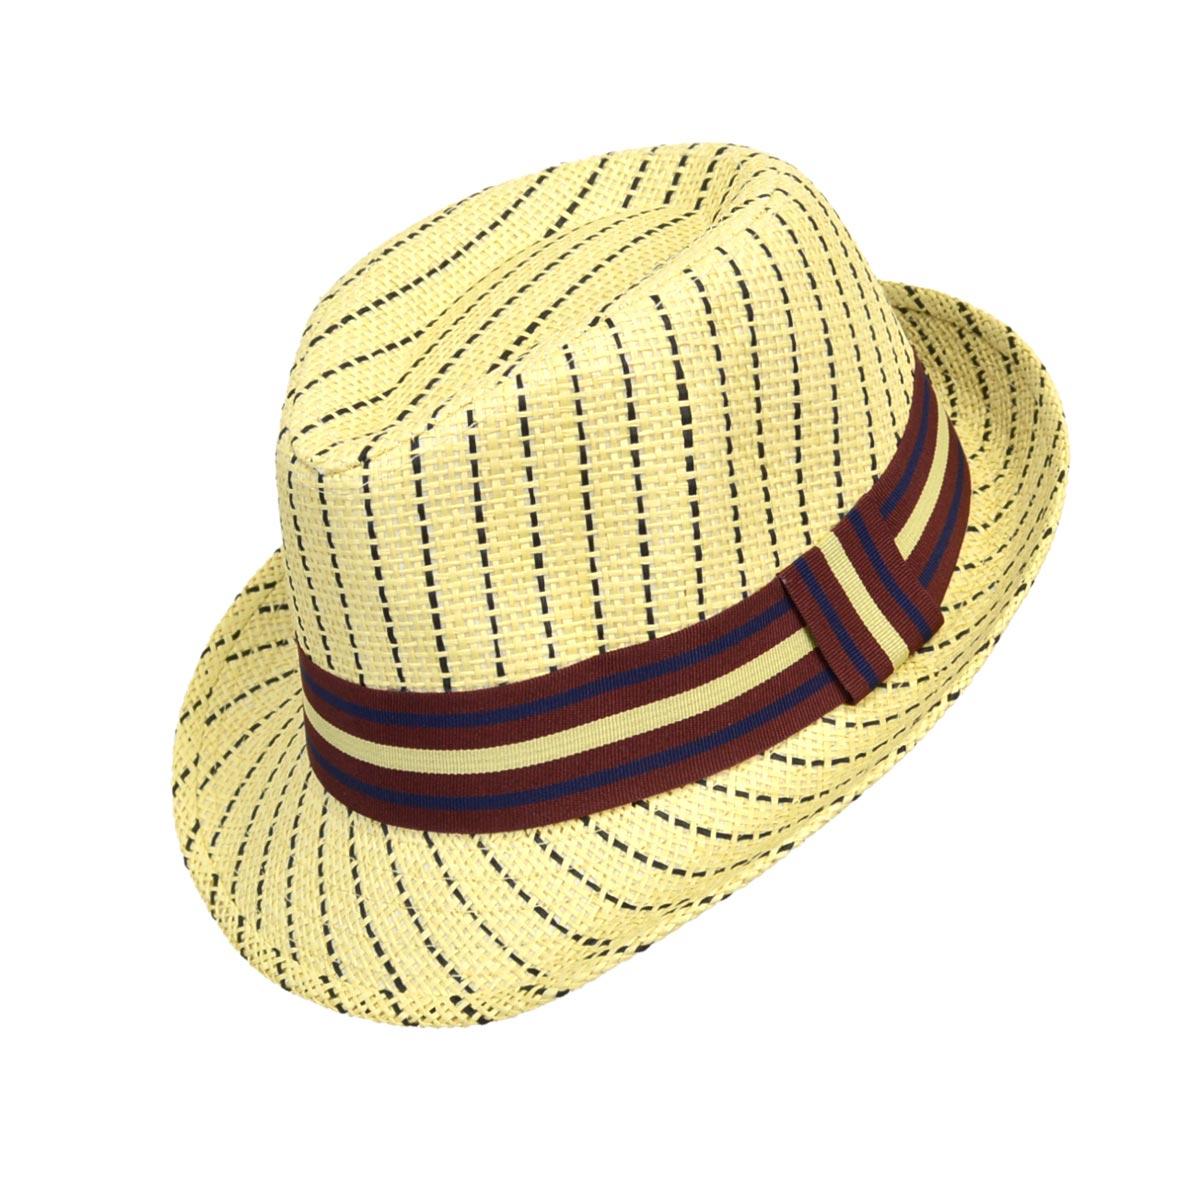 6pc Boy s Spring Summer Navy Striped Tan Straw Fedora Hats 5d145eca9b60